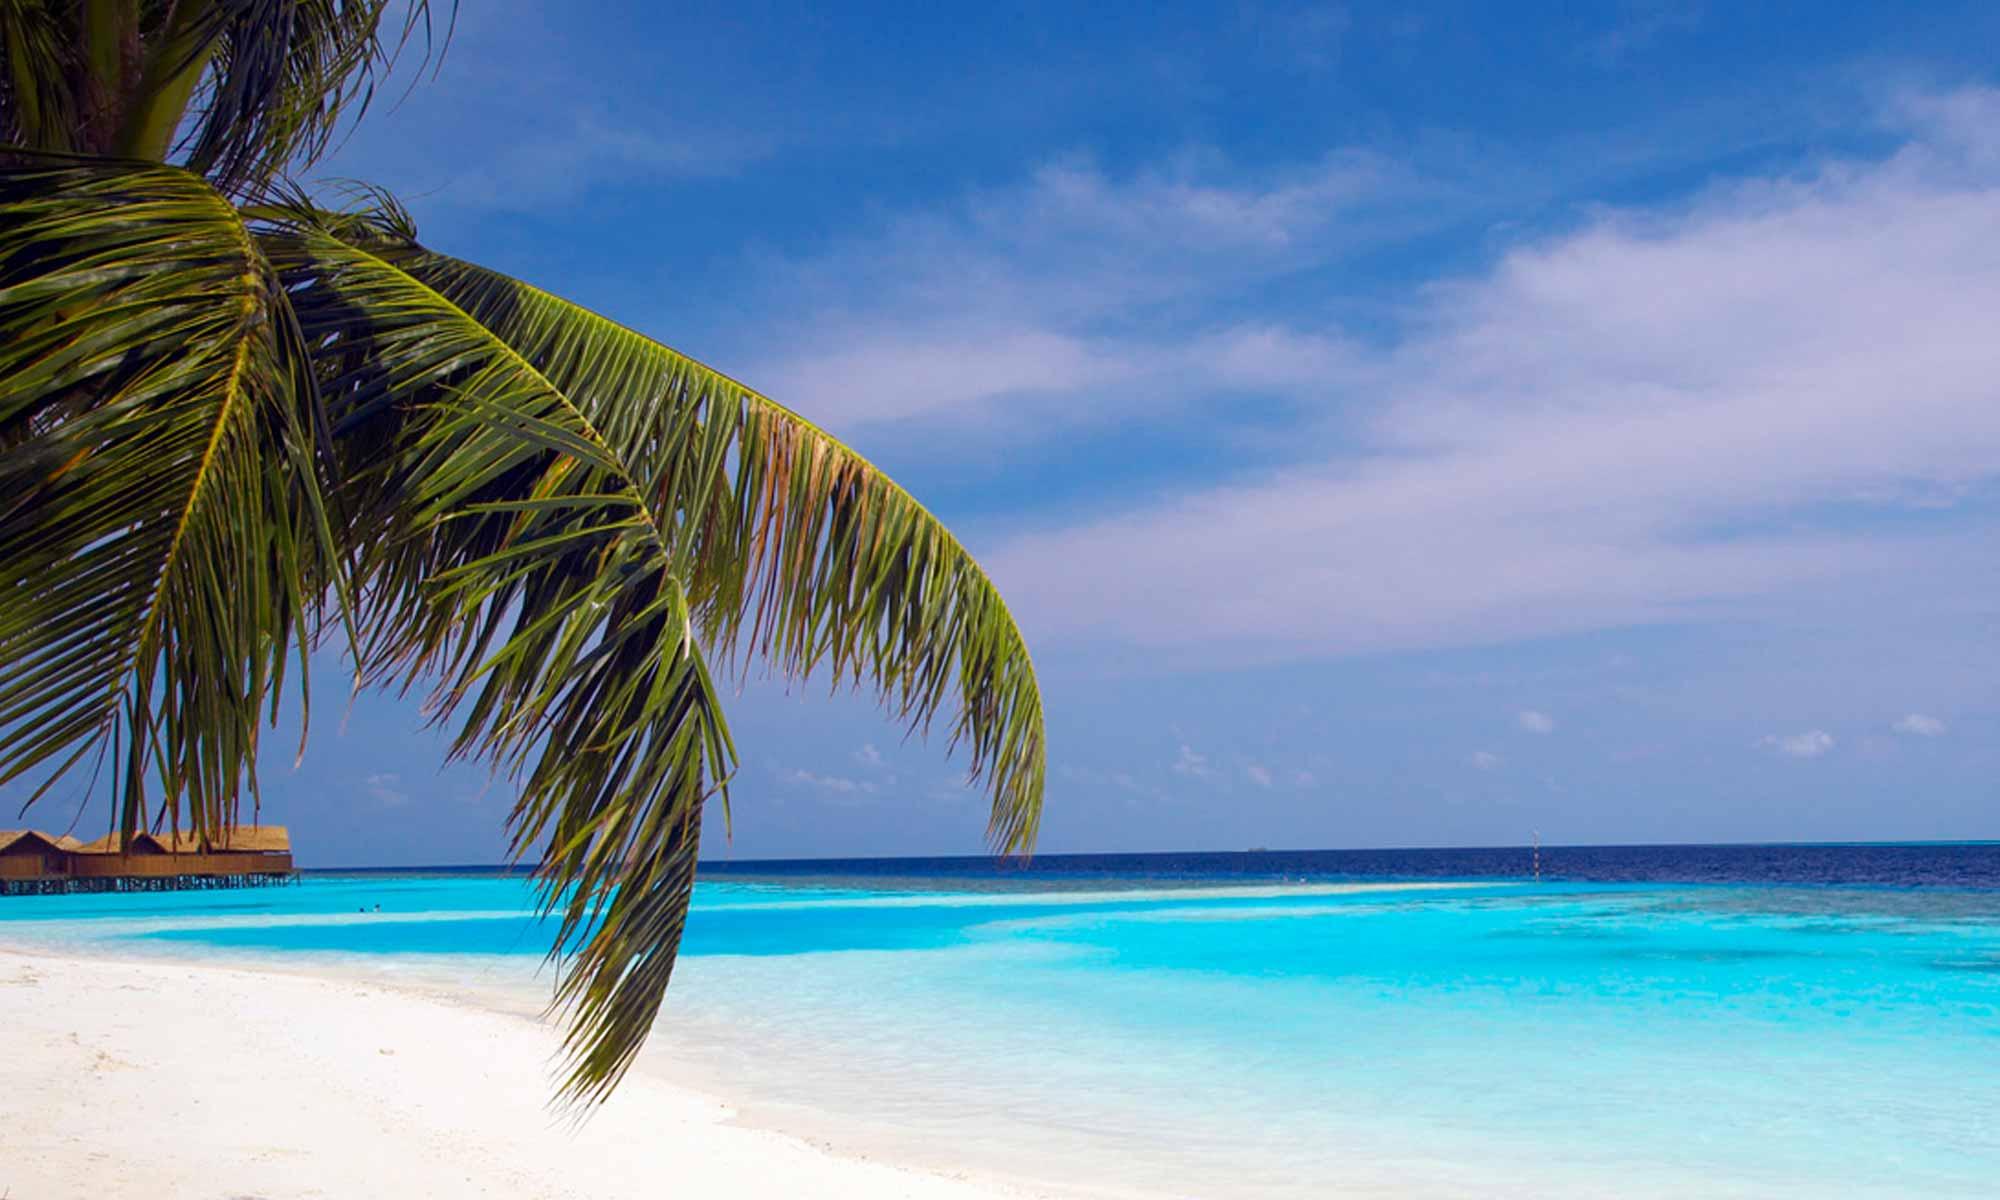 Slow Dive Indischer Ozean Malediven Pro Divers Lily Beach